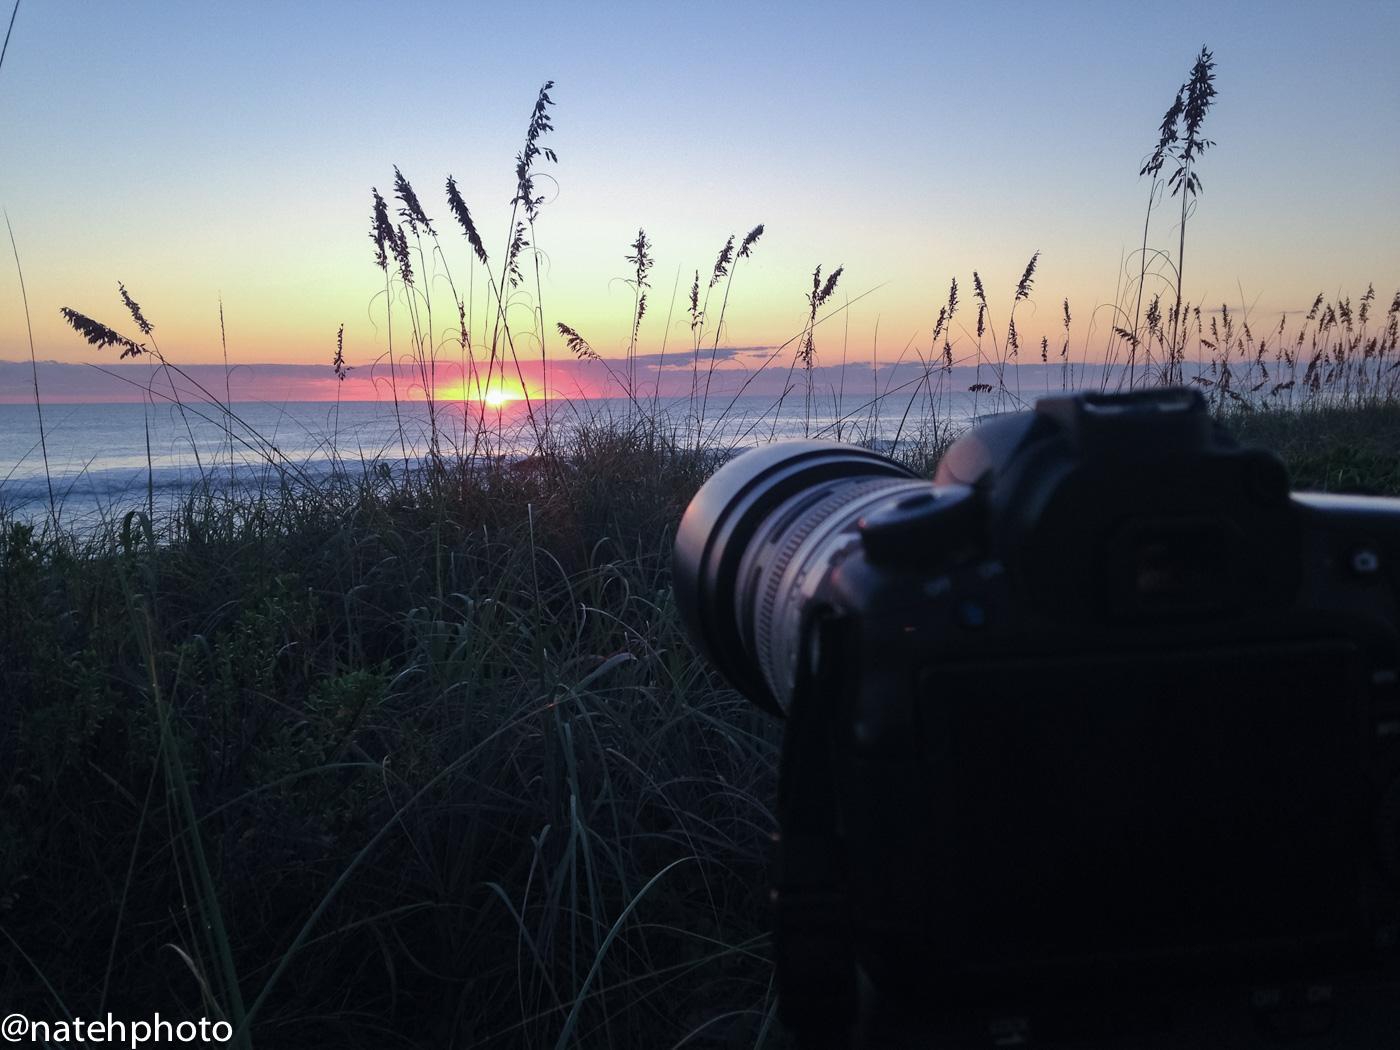 Shooting the sunrise at Sebastian a few weeks ago.